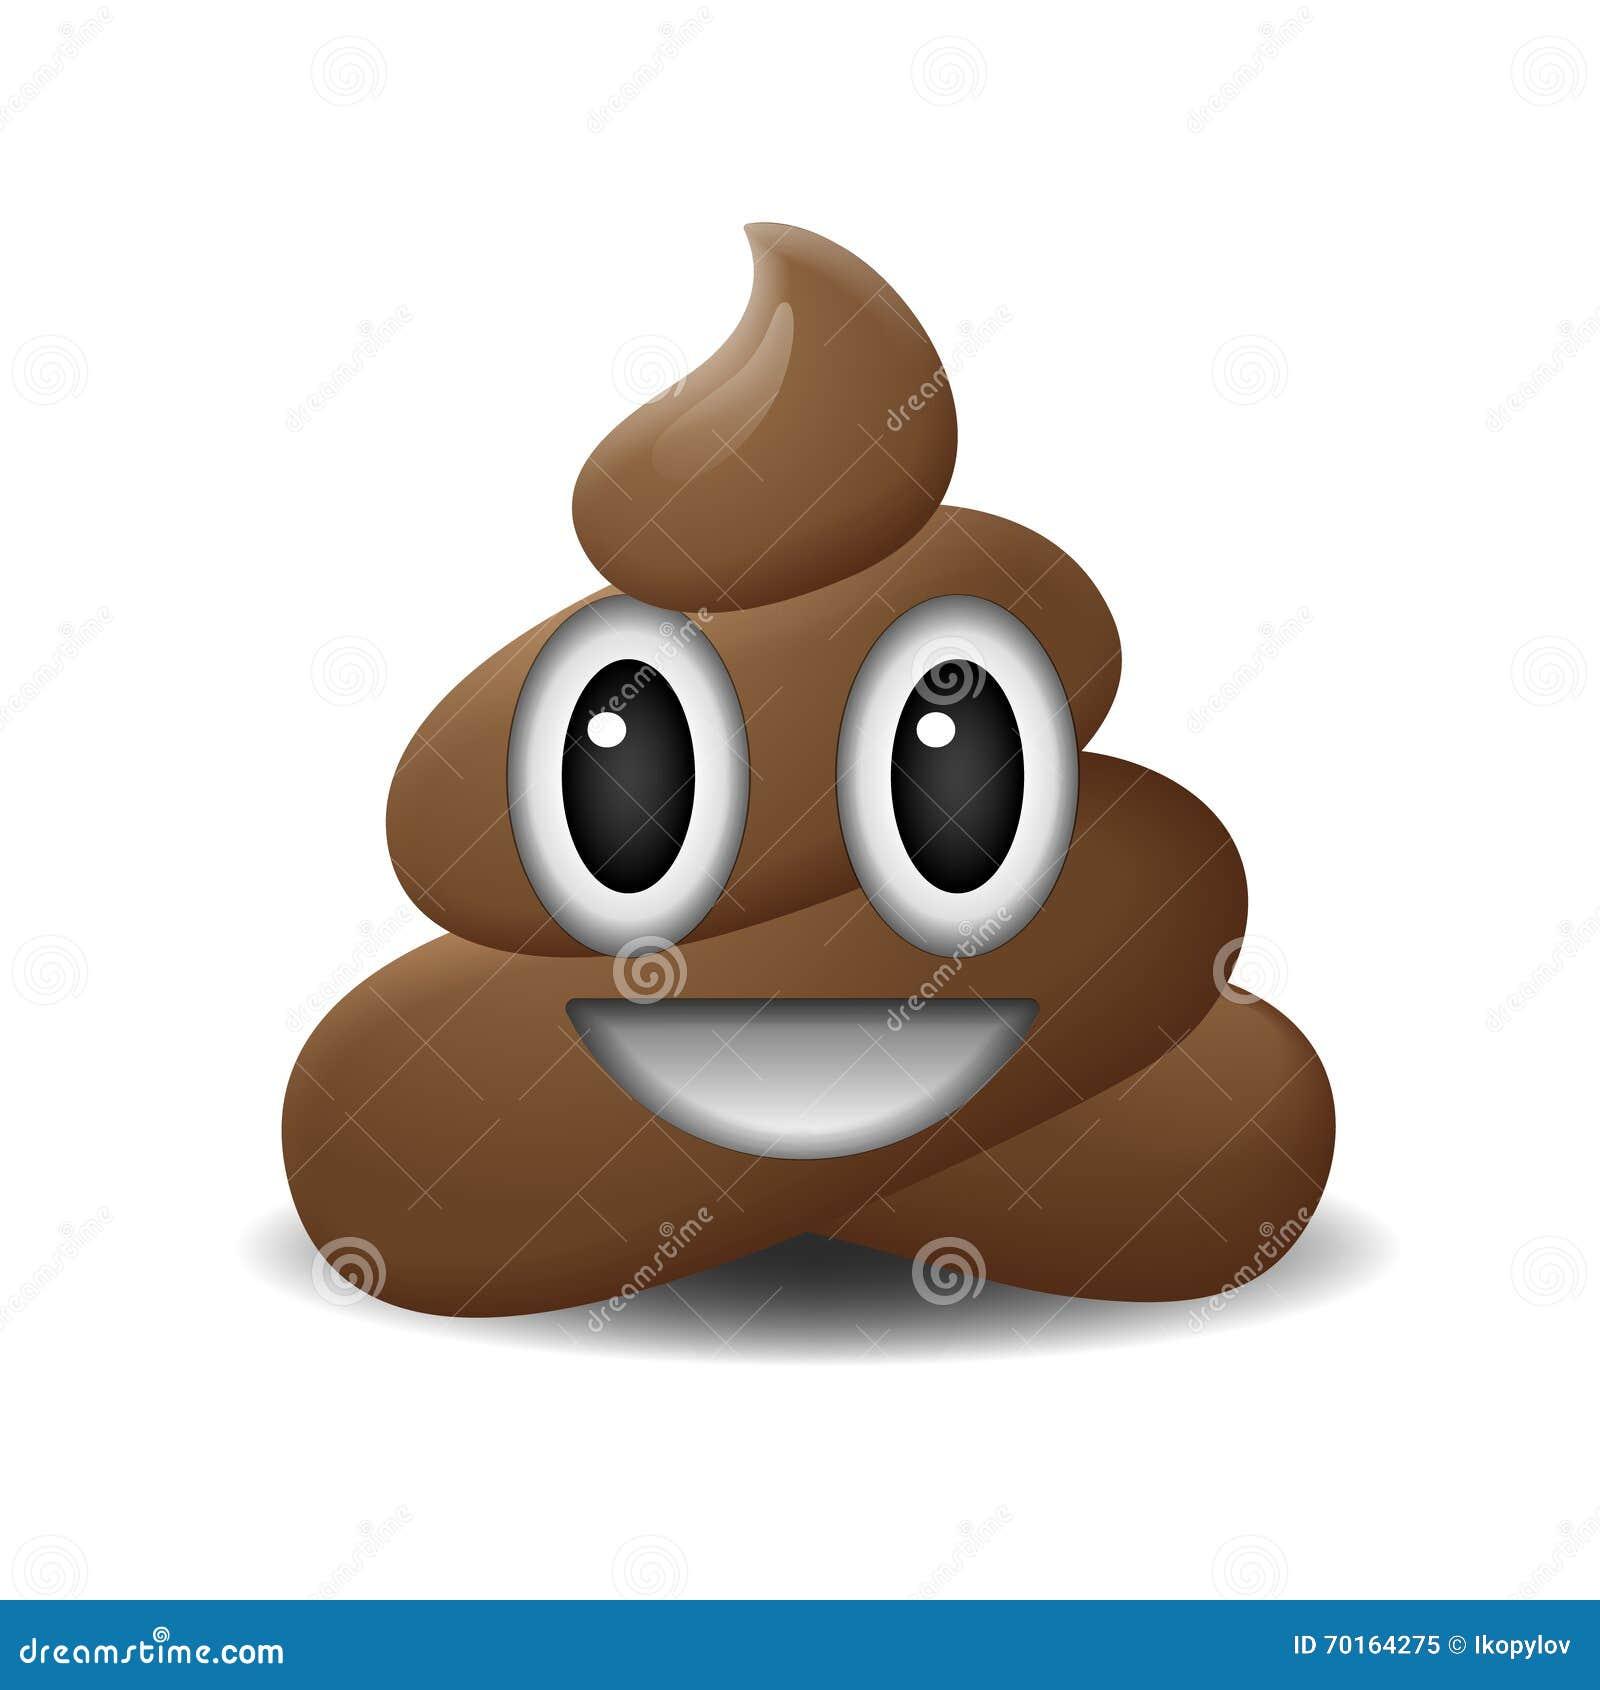 gwno-ikona-umiechnita-twarz-symbol-emoji-70164275.jpg